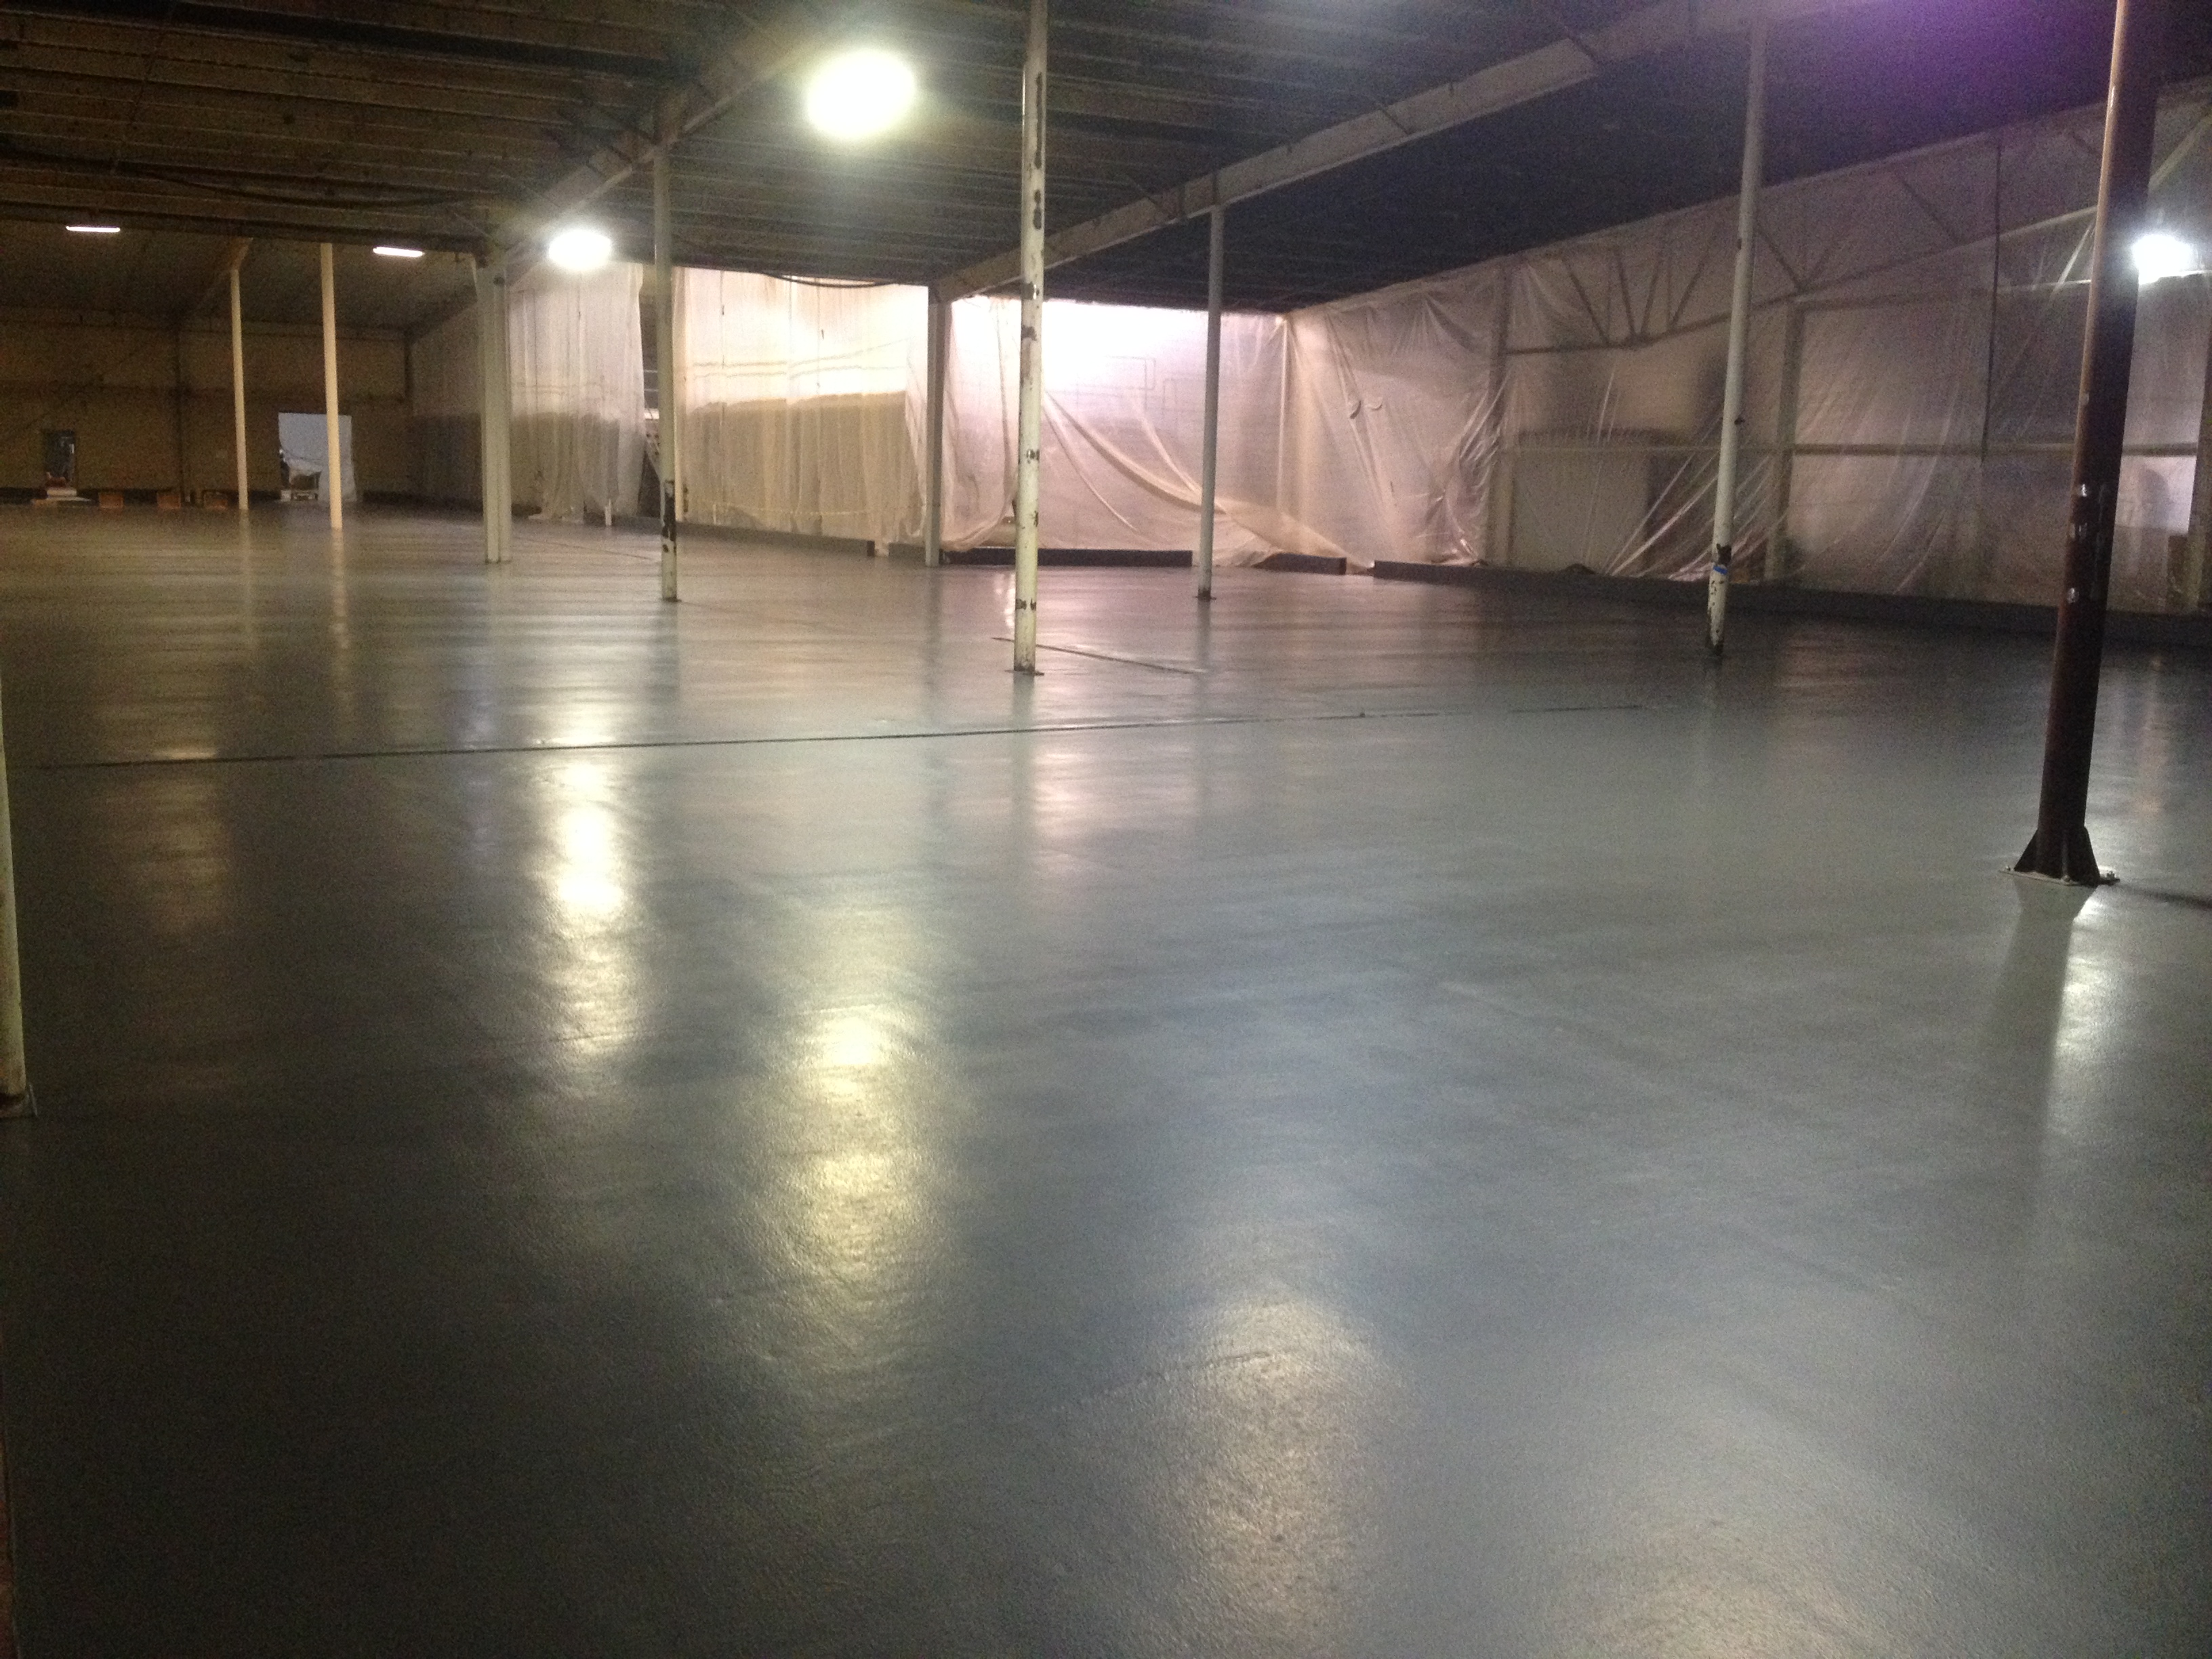 Dur-A-Flex Urethane Flooring